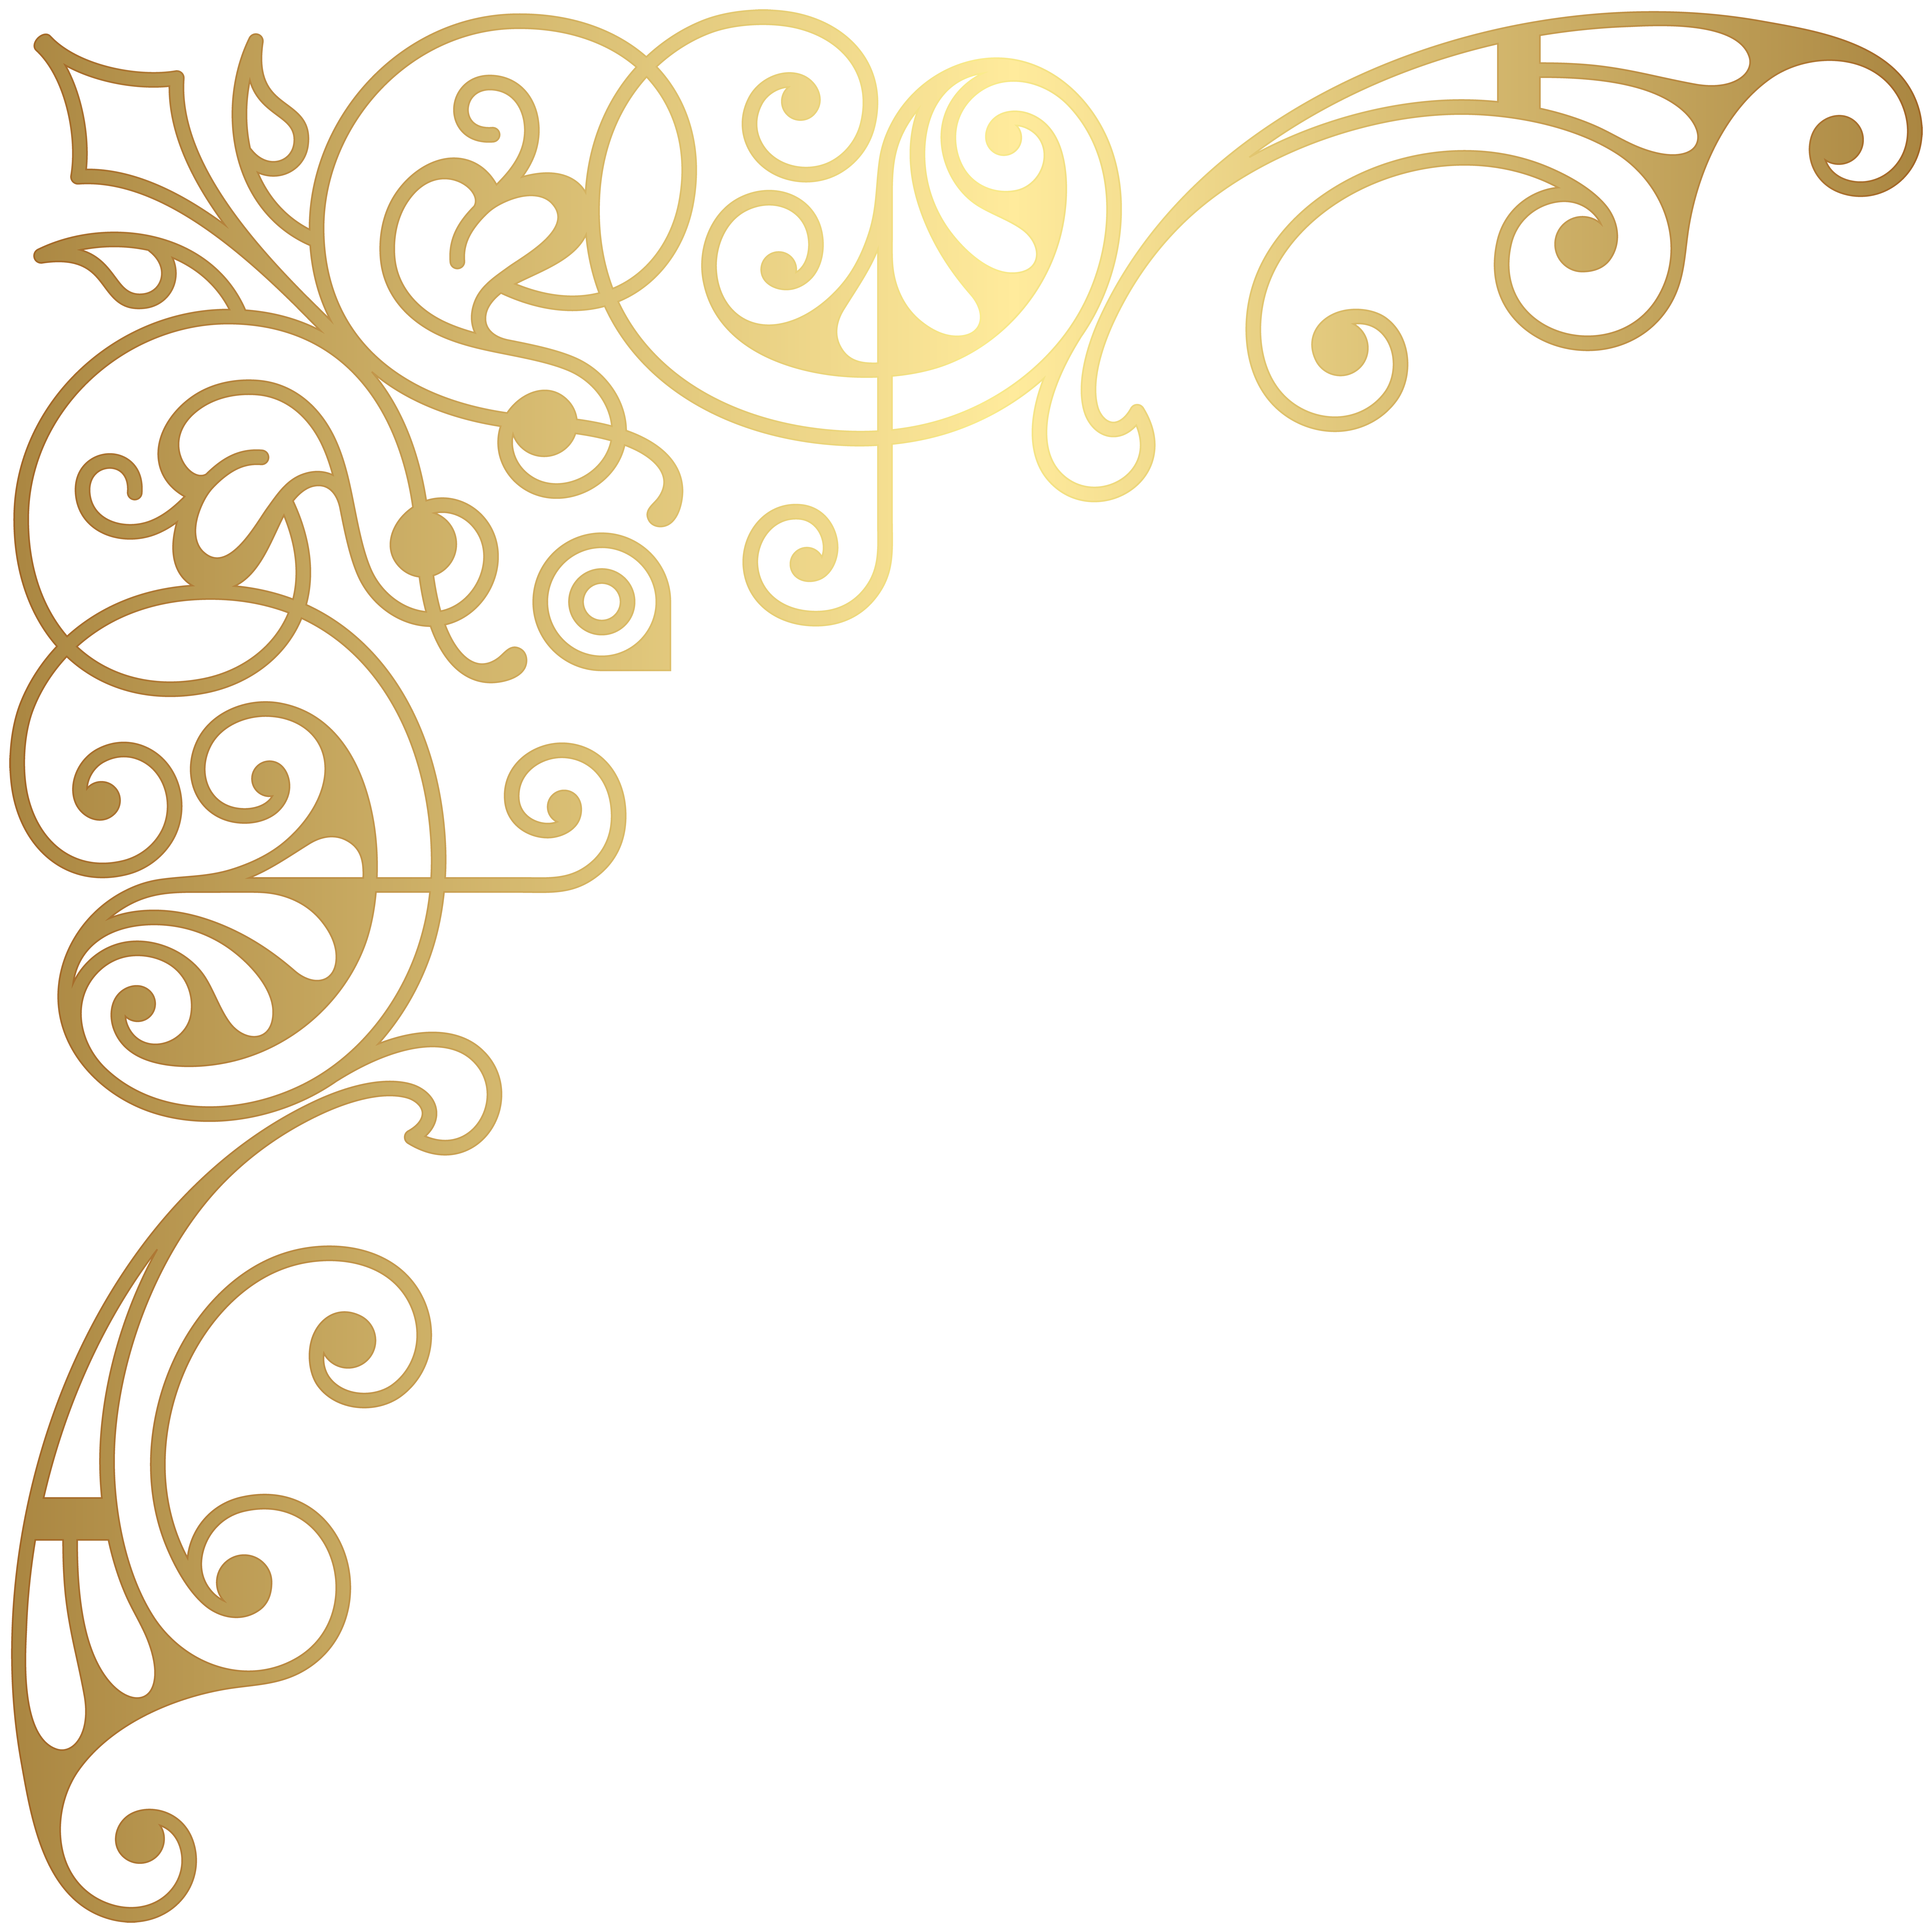 Clipart gallery visual art. Gold corner decorative transparent